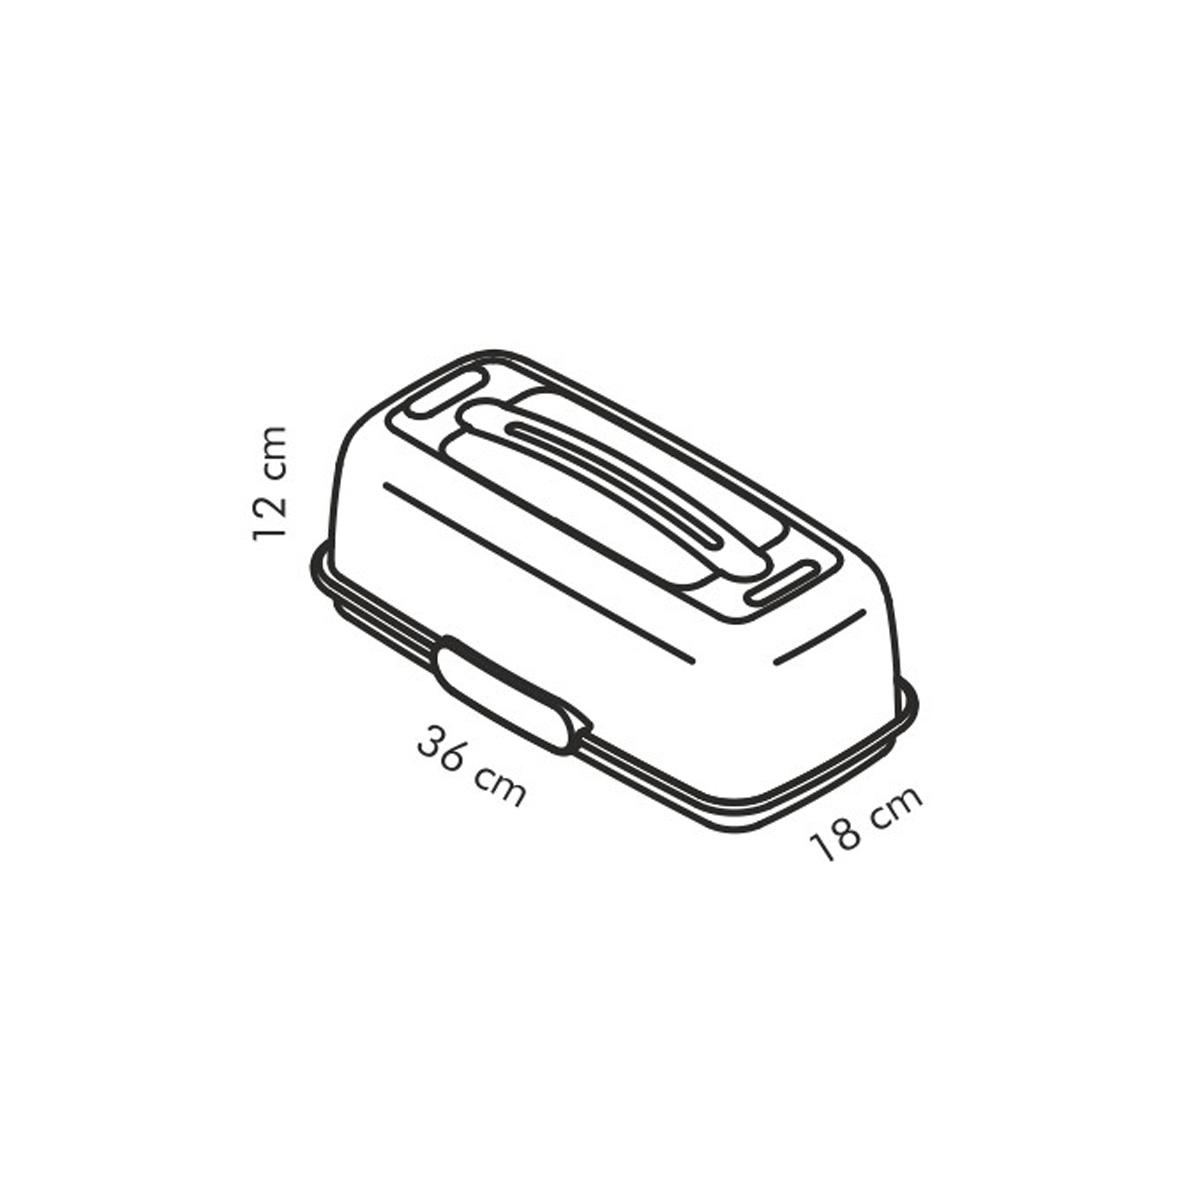 Chladicí podnos s poklopem DELÍCIA 36x18 cm